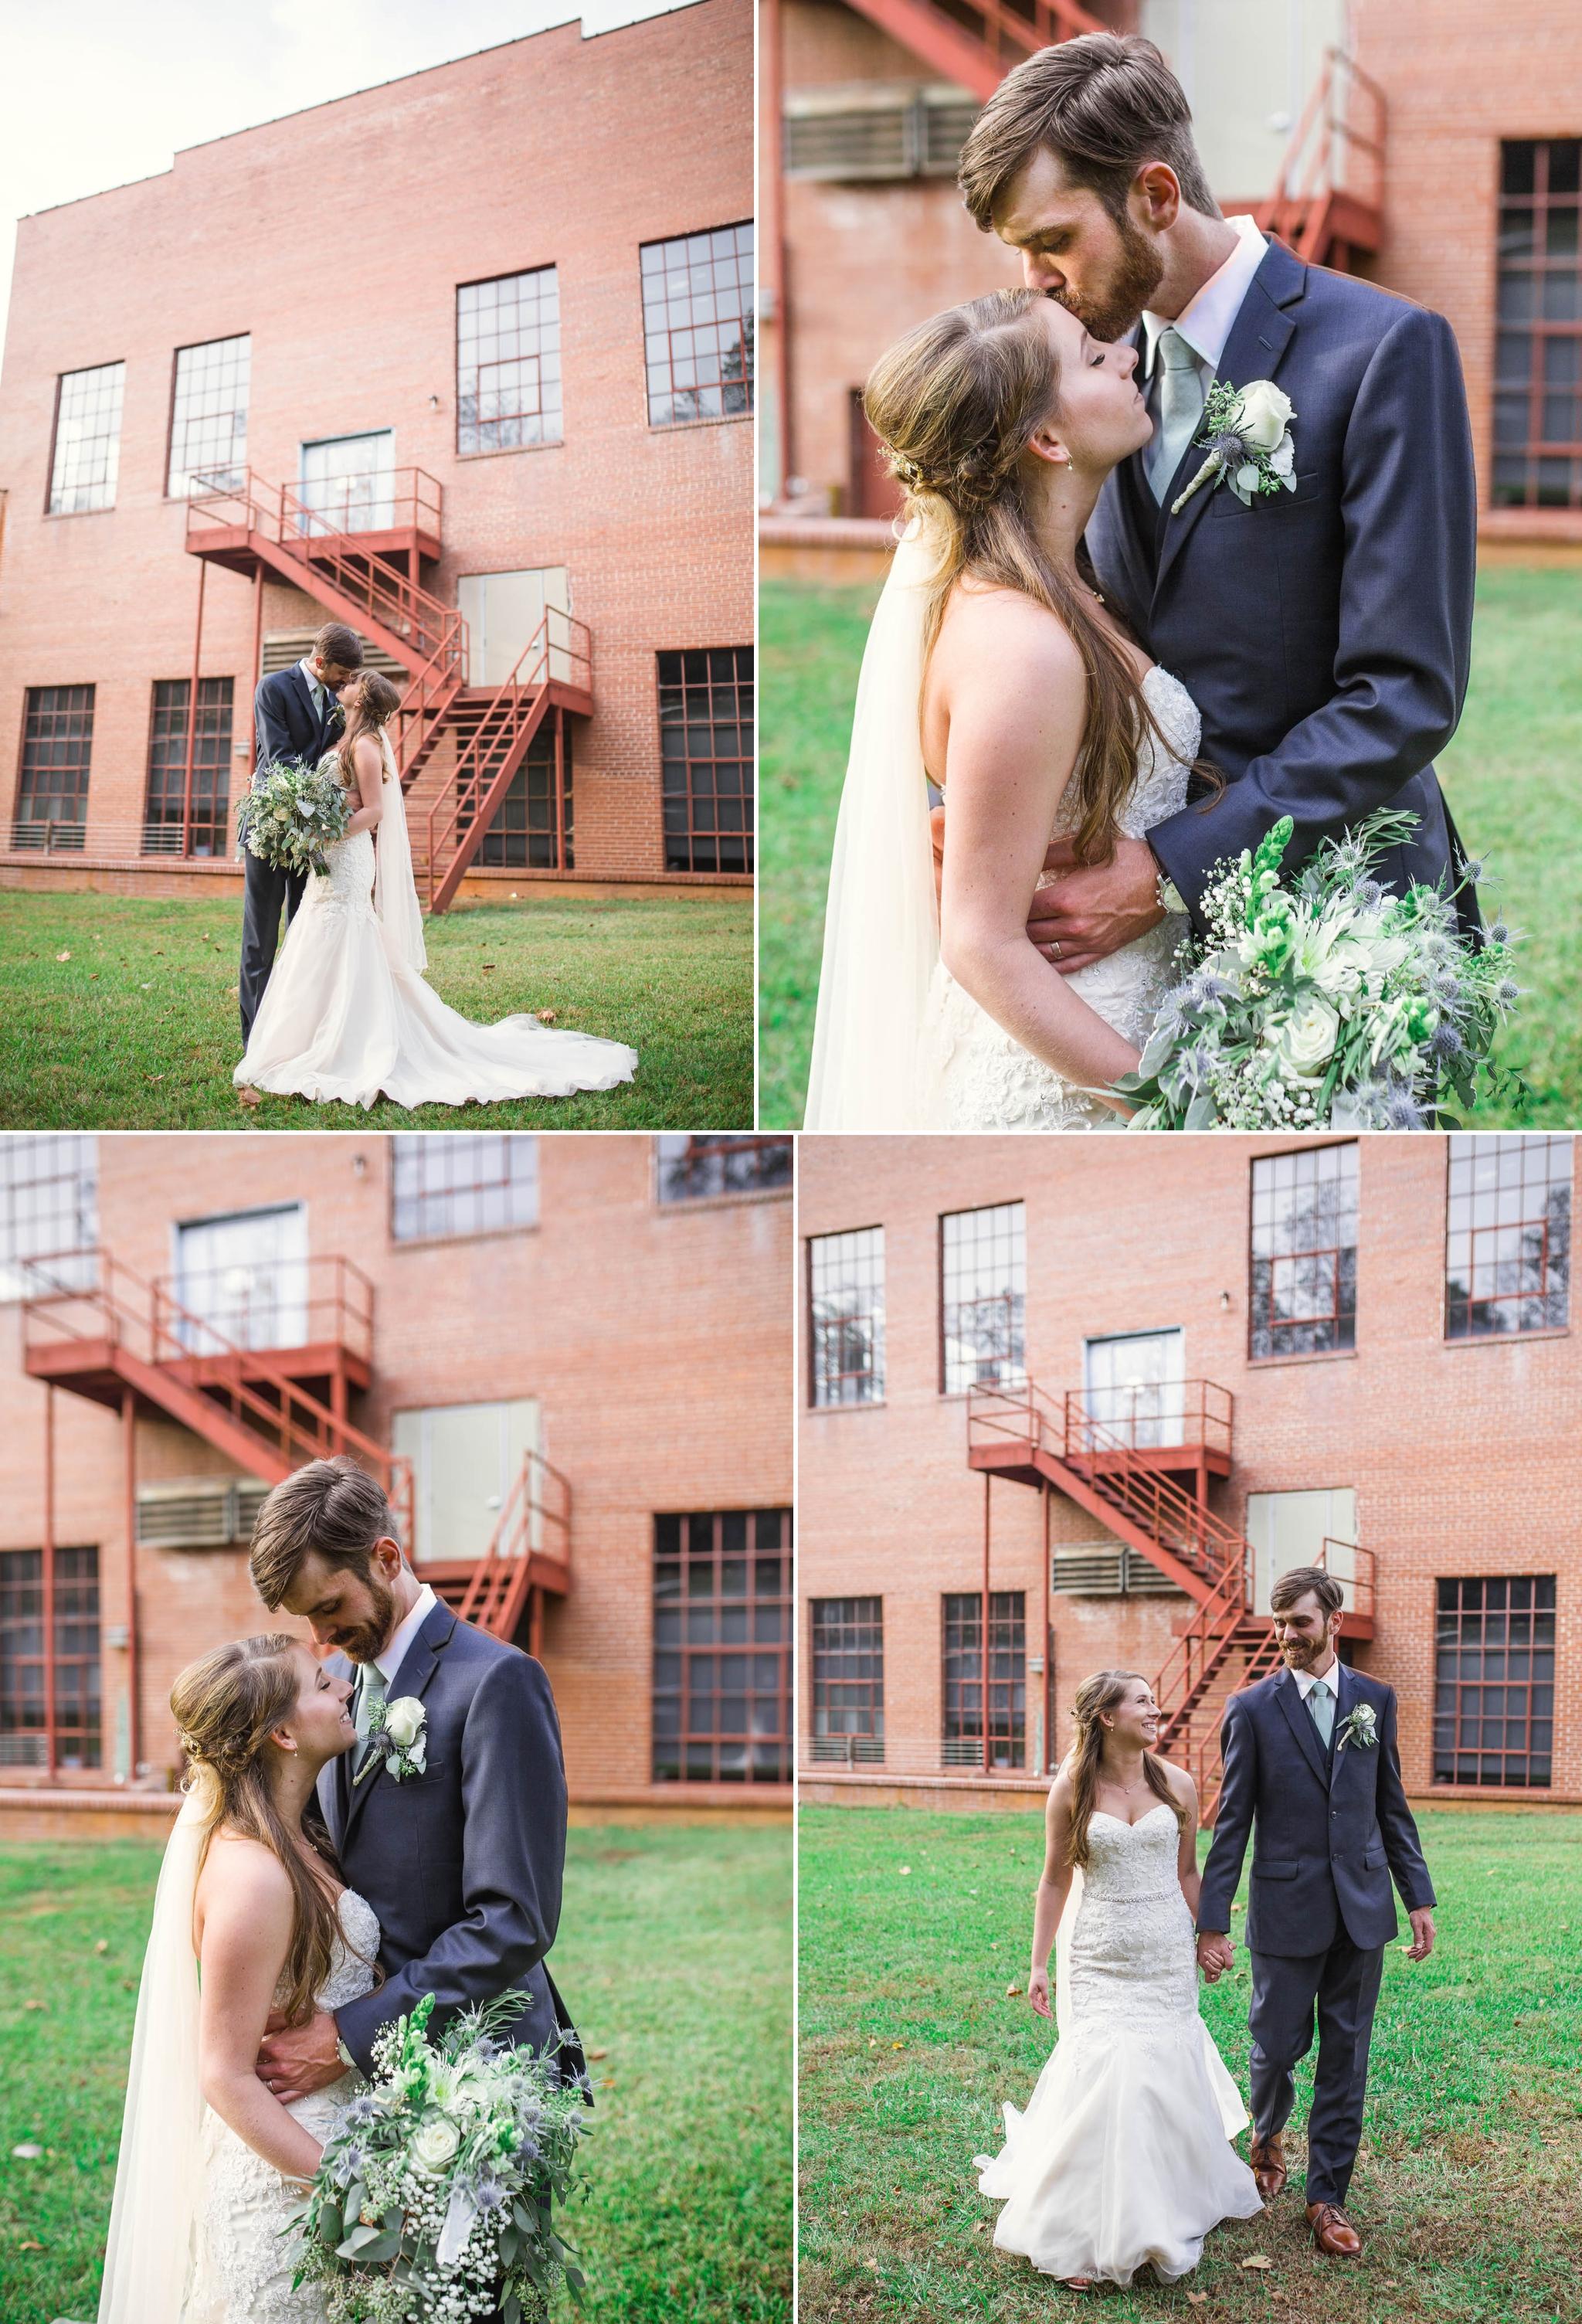 Outdoor Bride and Groom Portraits at Chatham Mills in Pittsboro North Carolina Wedding Photography - Johanna Dye - Meredith and Brandon